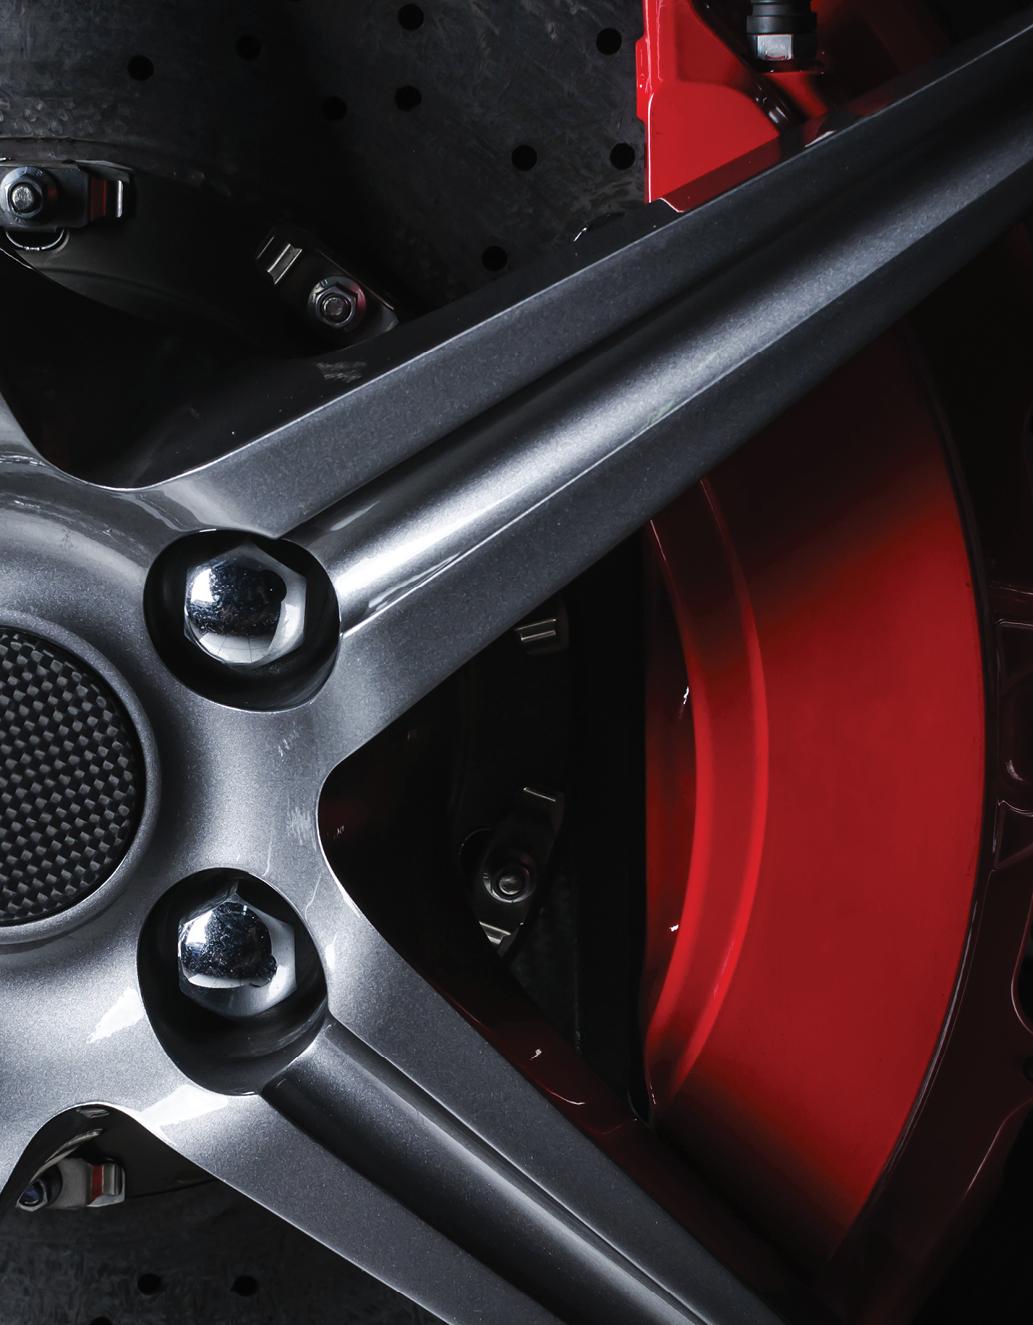 MLT_Auto_Parts_599575669